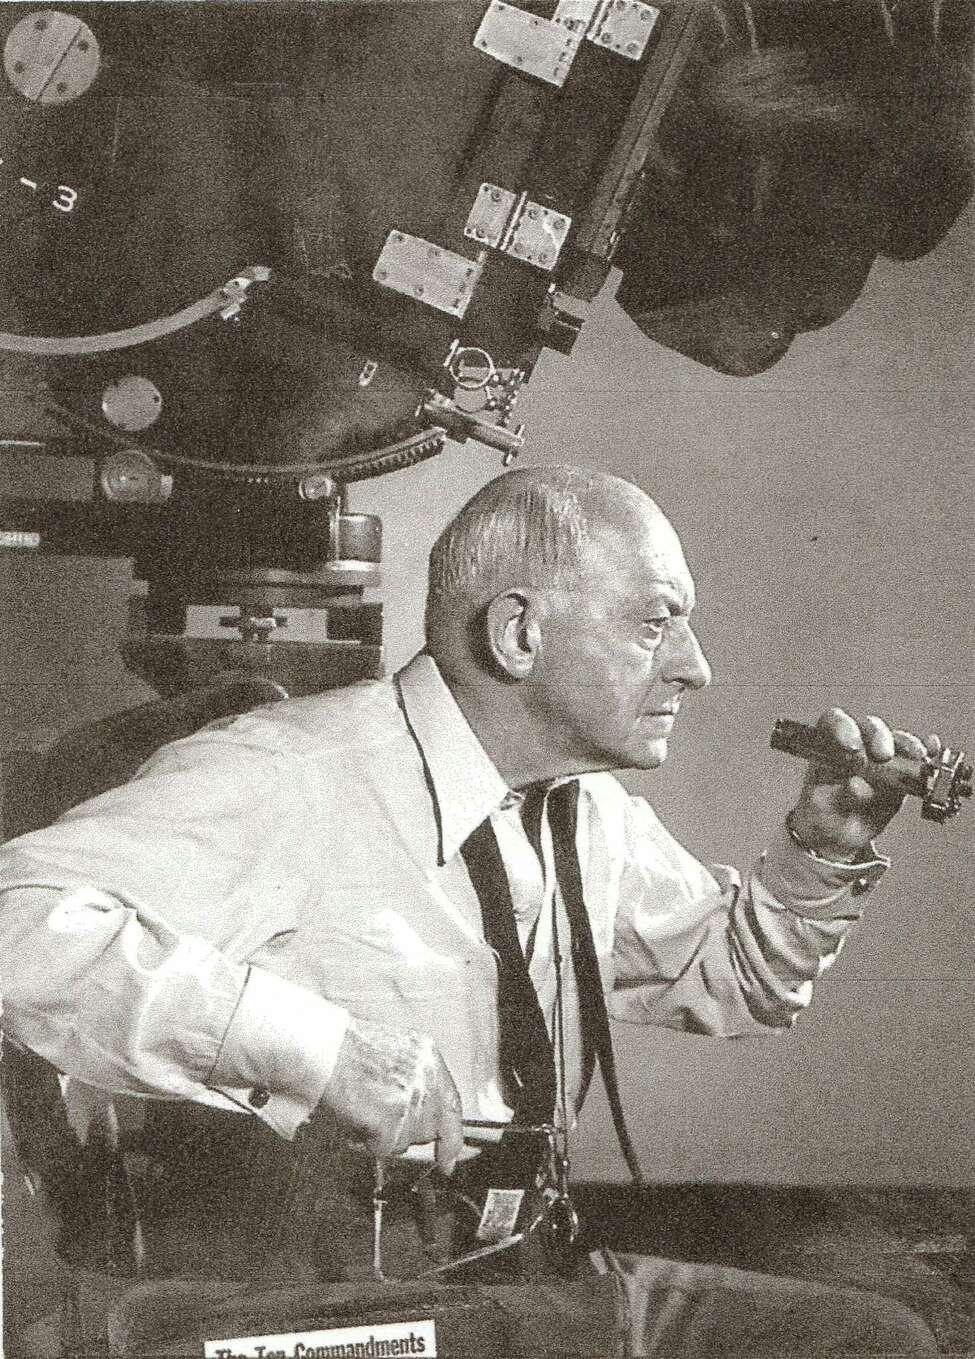 Cecil B. DeMille (Pine Hills film Colony)